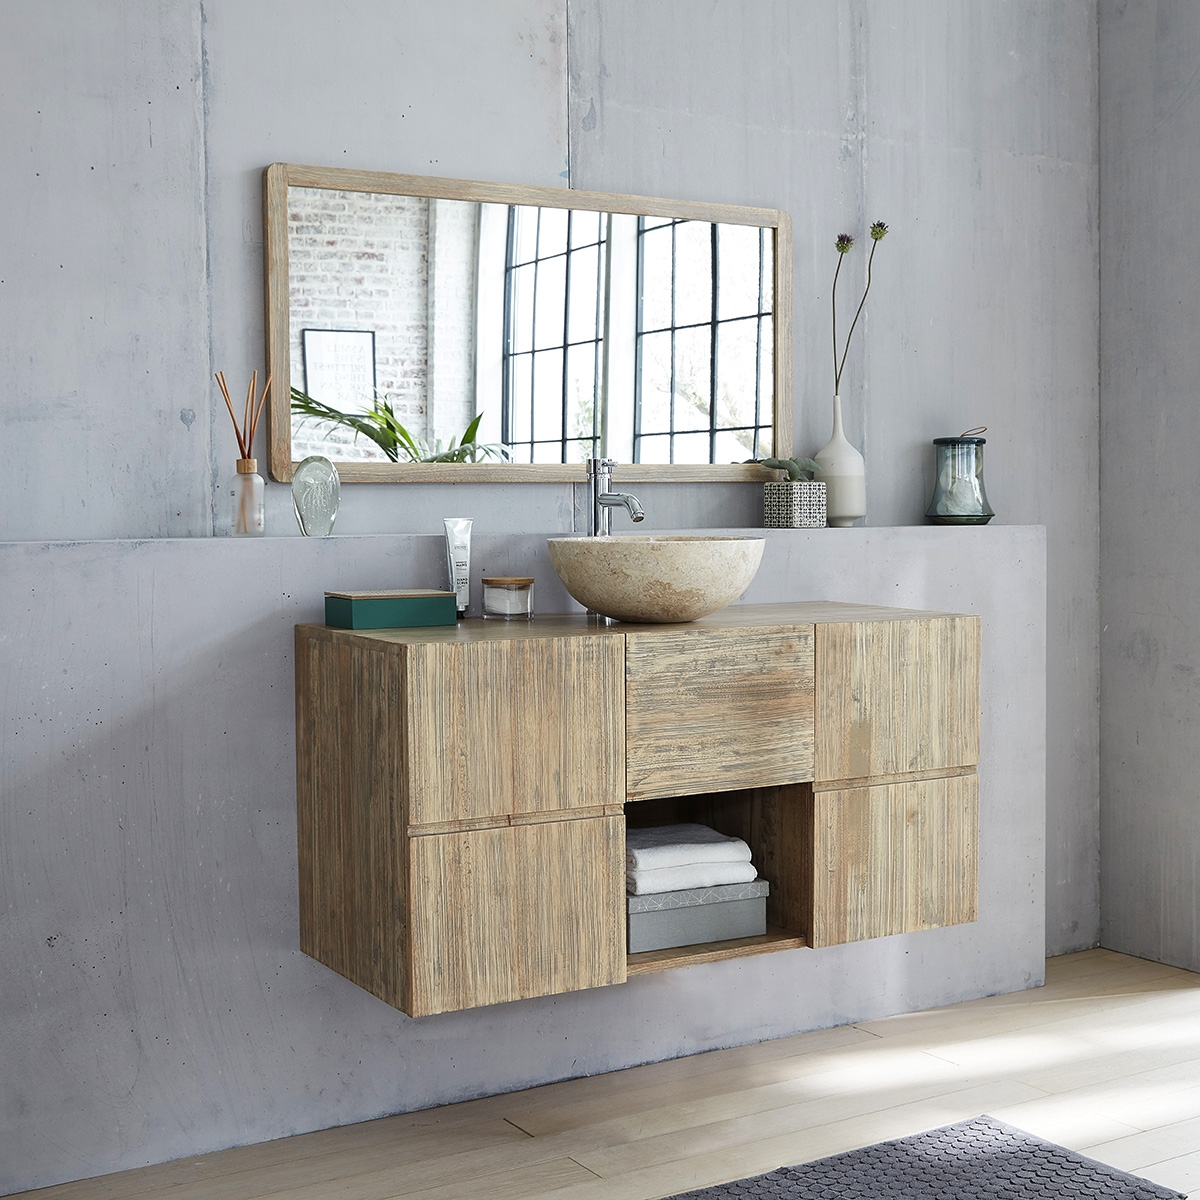 Miroir Salle De Bain 120 ensemble salle de bain en bois d'hévéa suspendu 120 - vasque